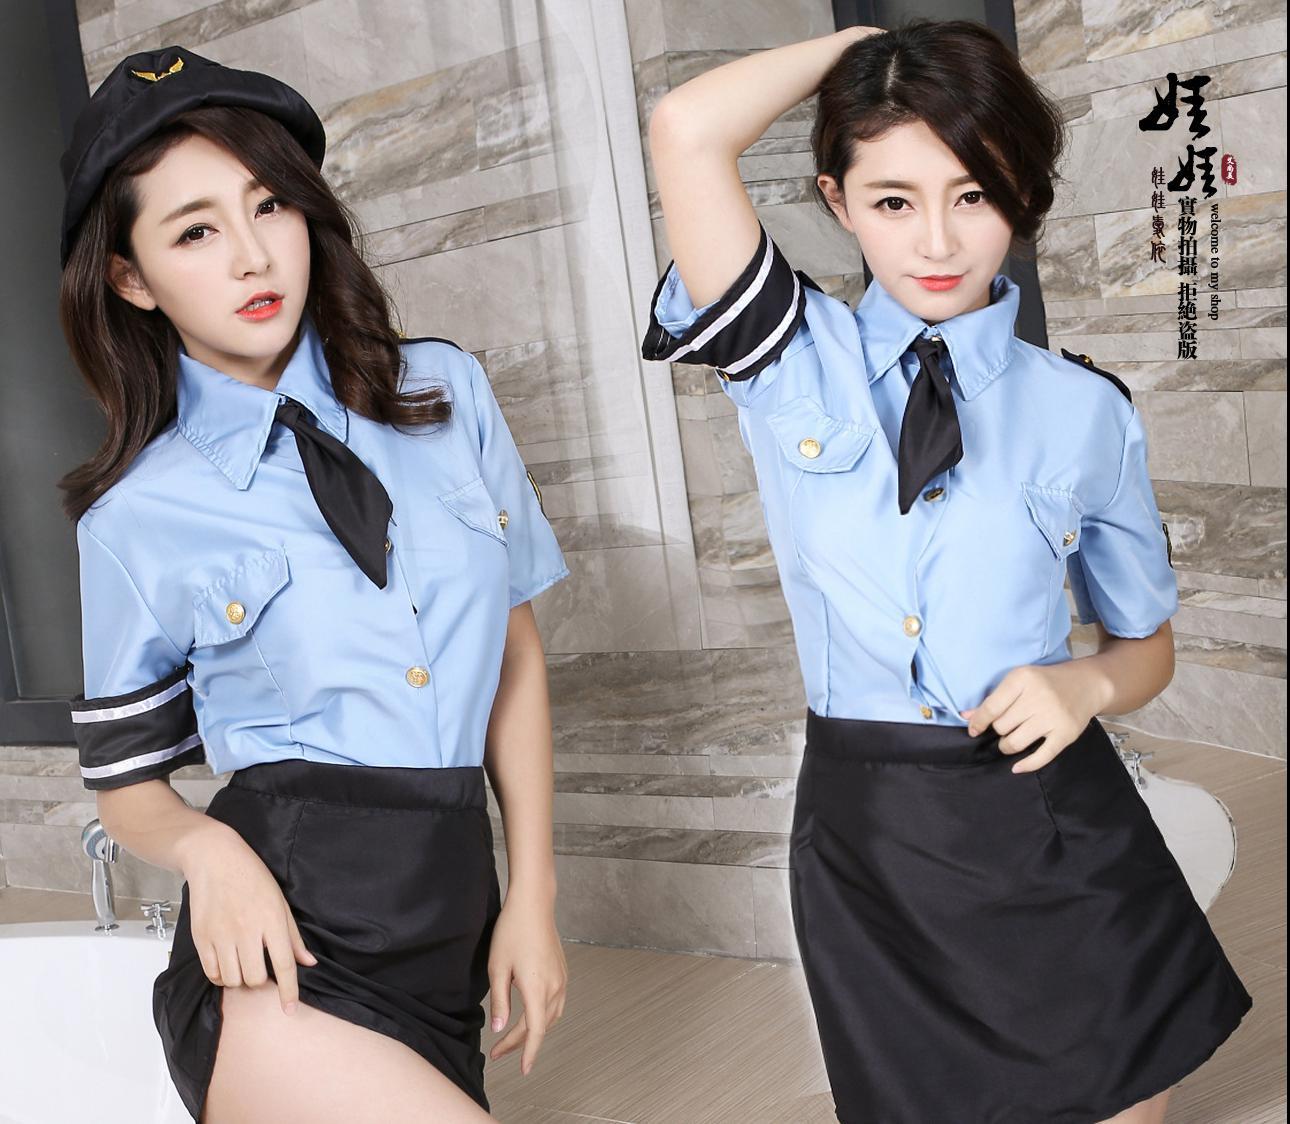 Hardcore Police Sex 111